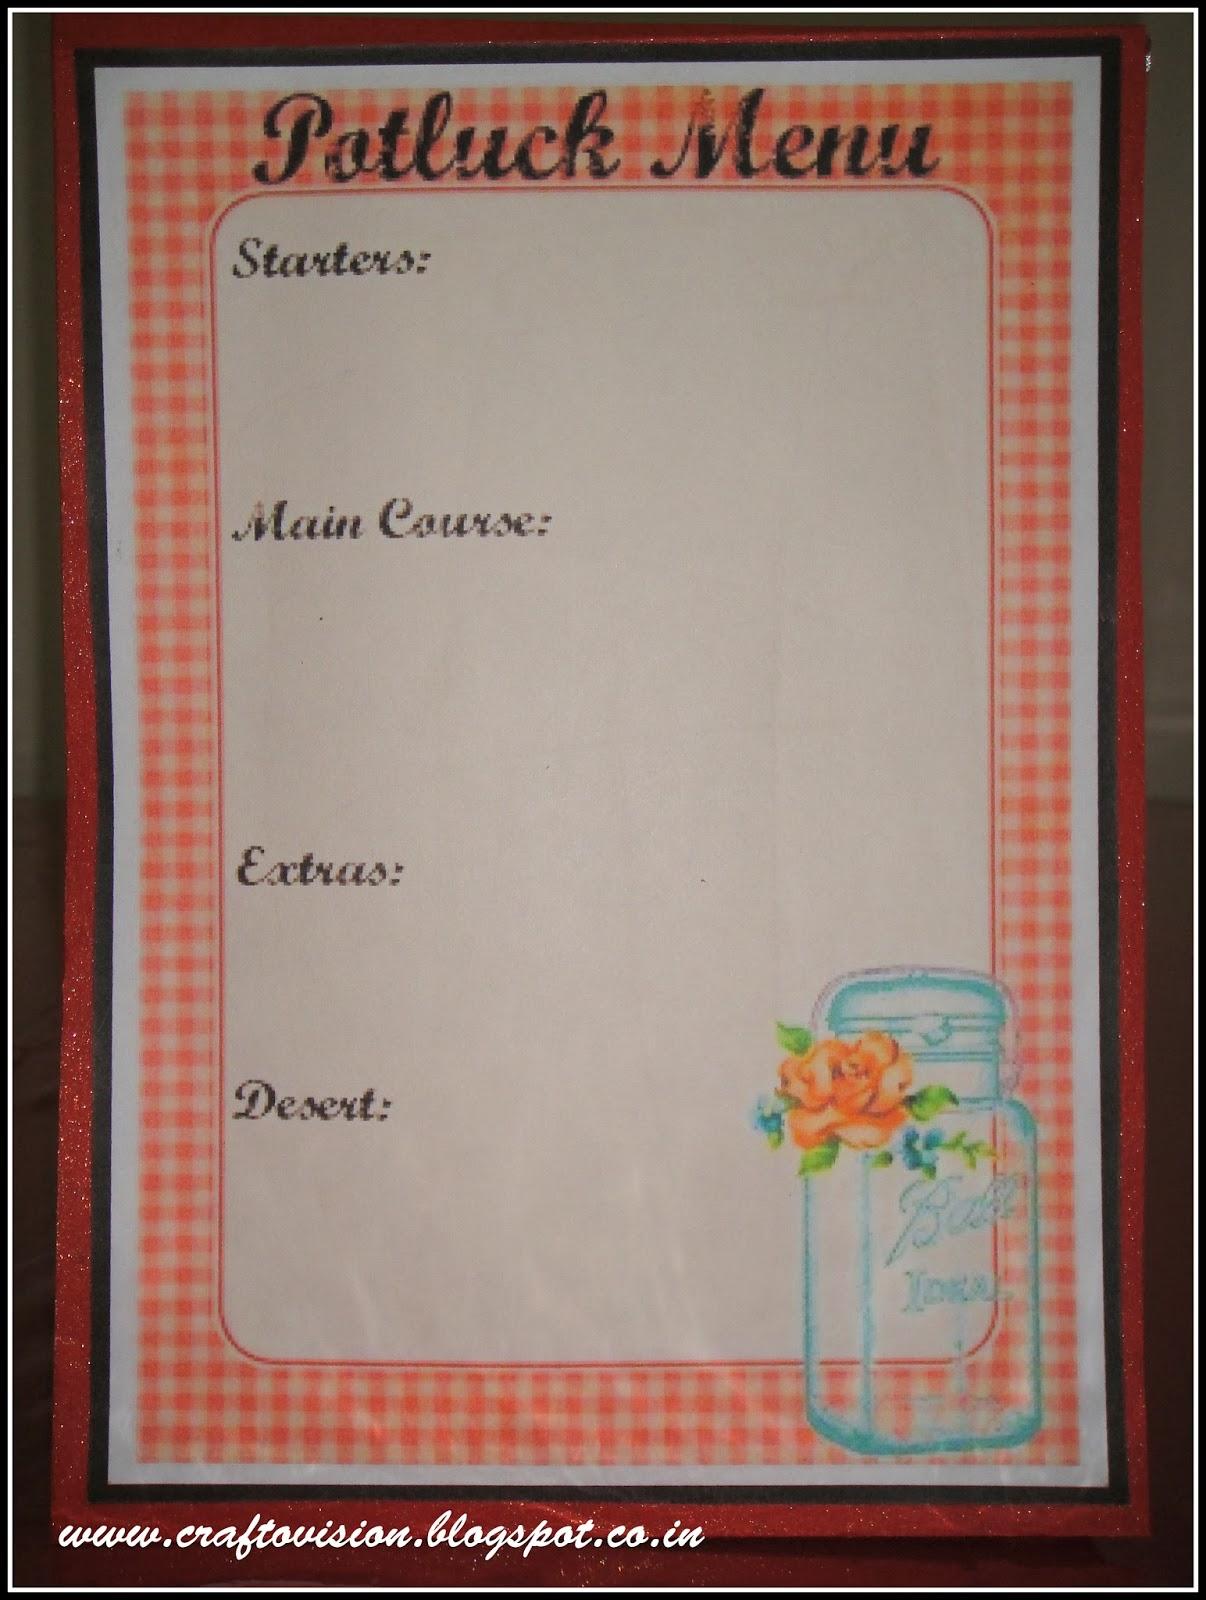 Blank Menu Design Templates Potluck menu & labels